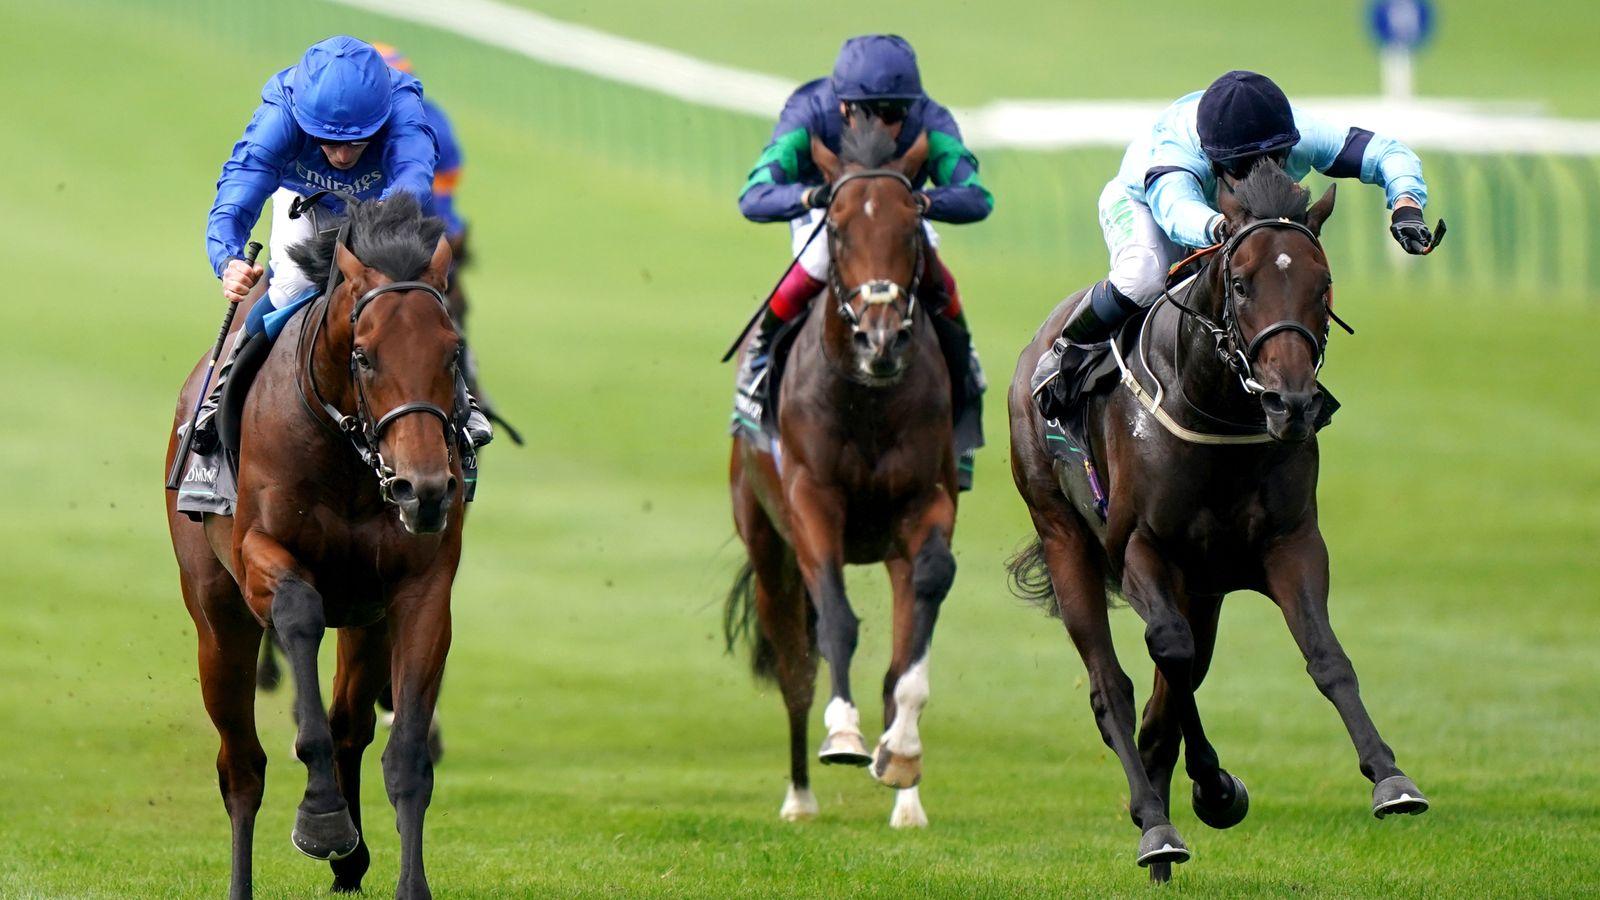 Royal Patronage rallies to land thrilling Royal Lodge Stakes